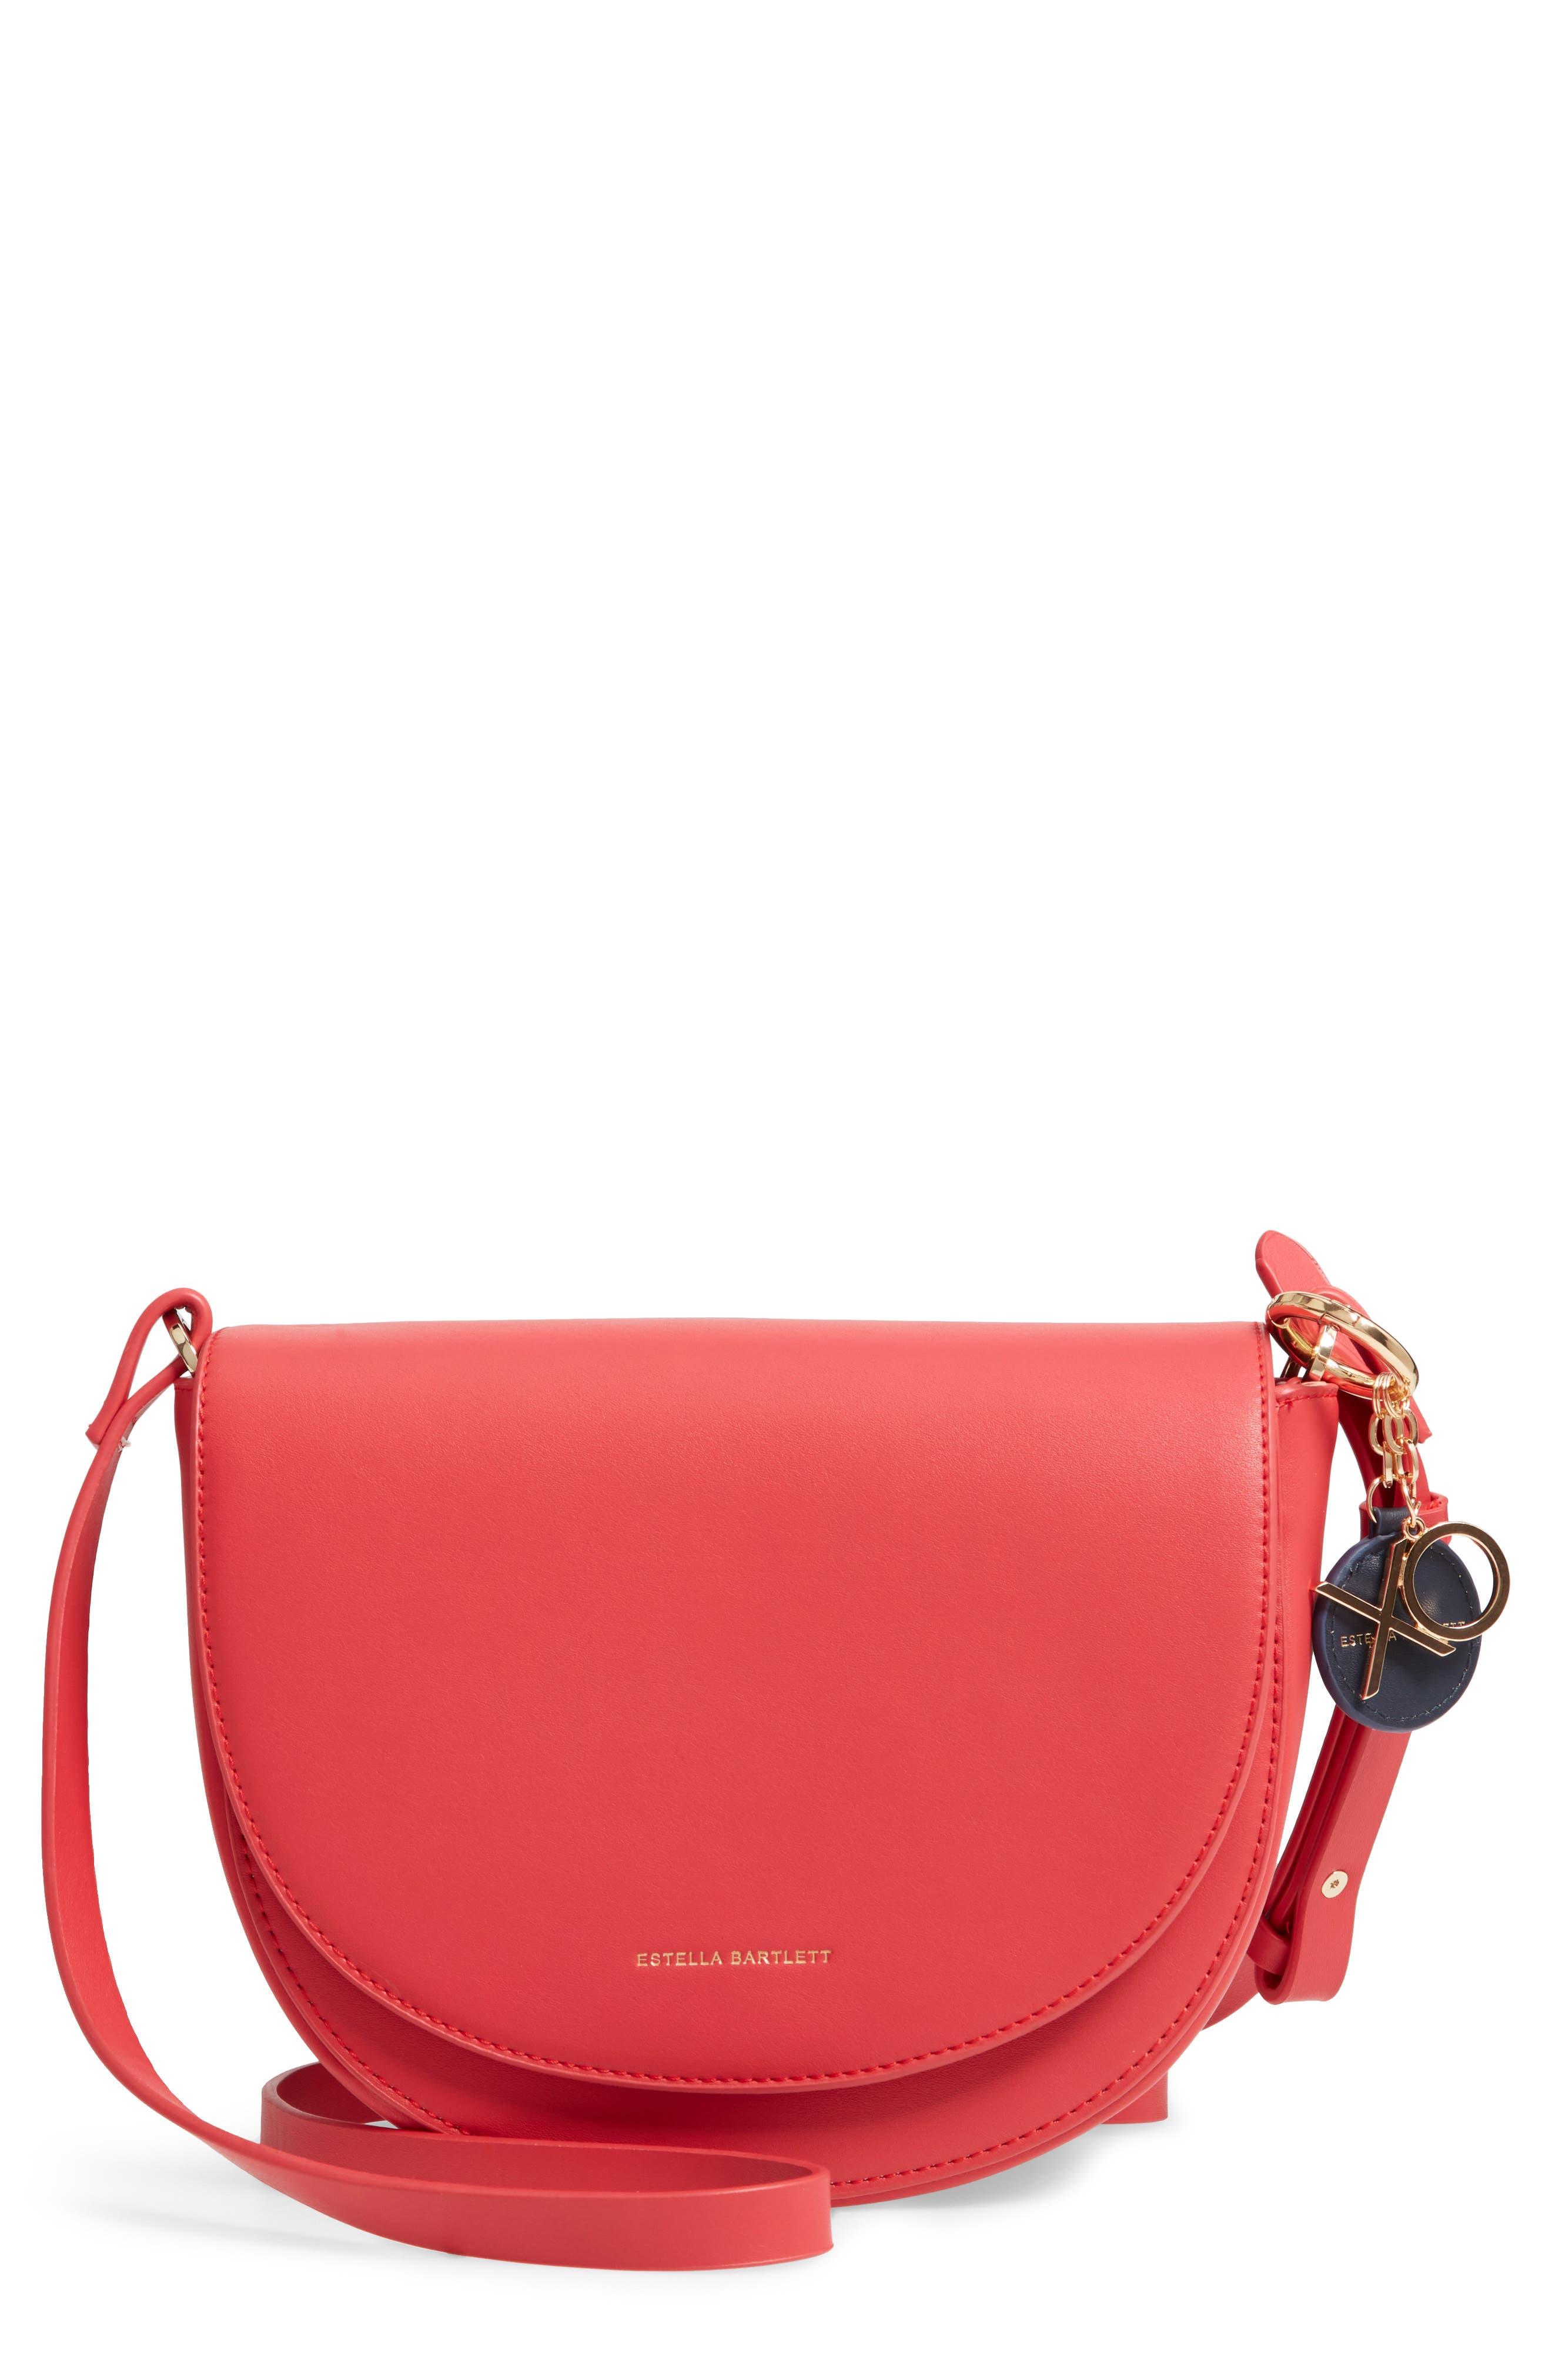 ESTELLA BARTLETT Loman Faux Leather Saddle Bag, Main, color, 600